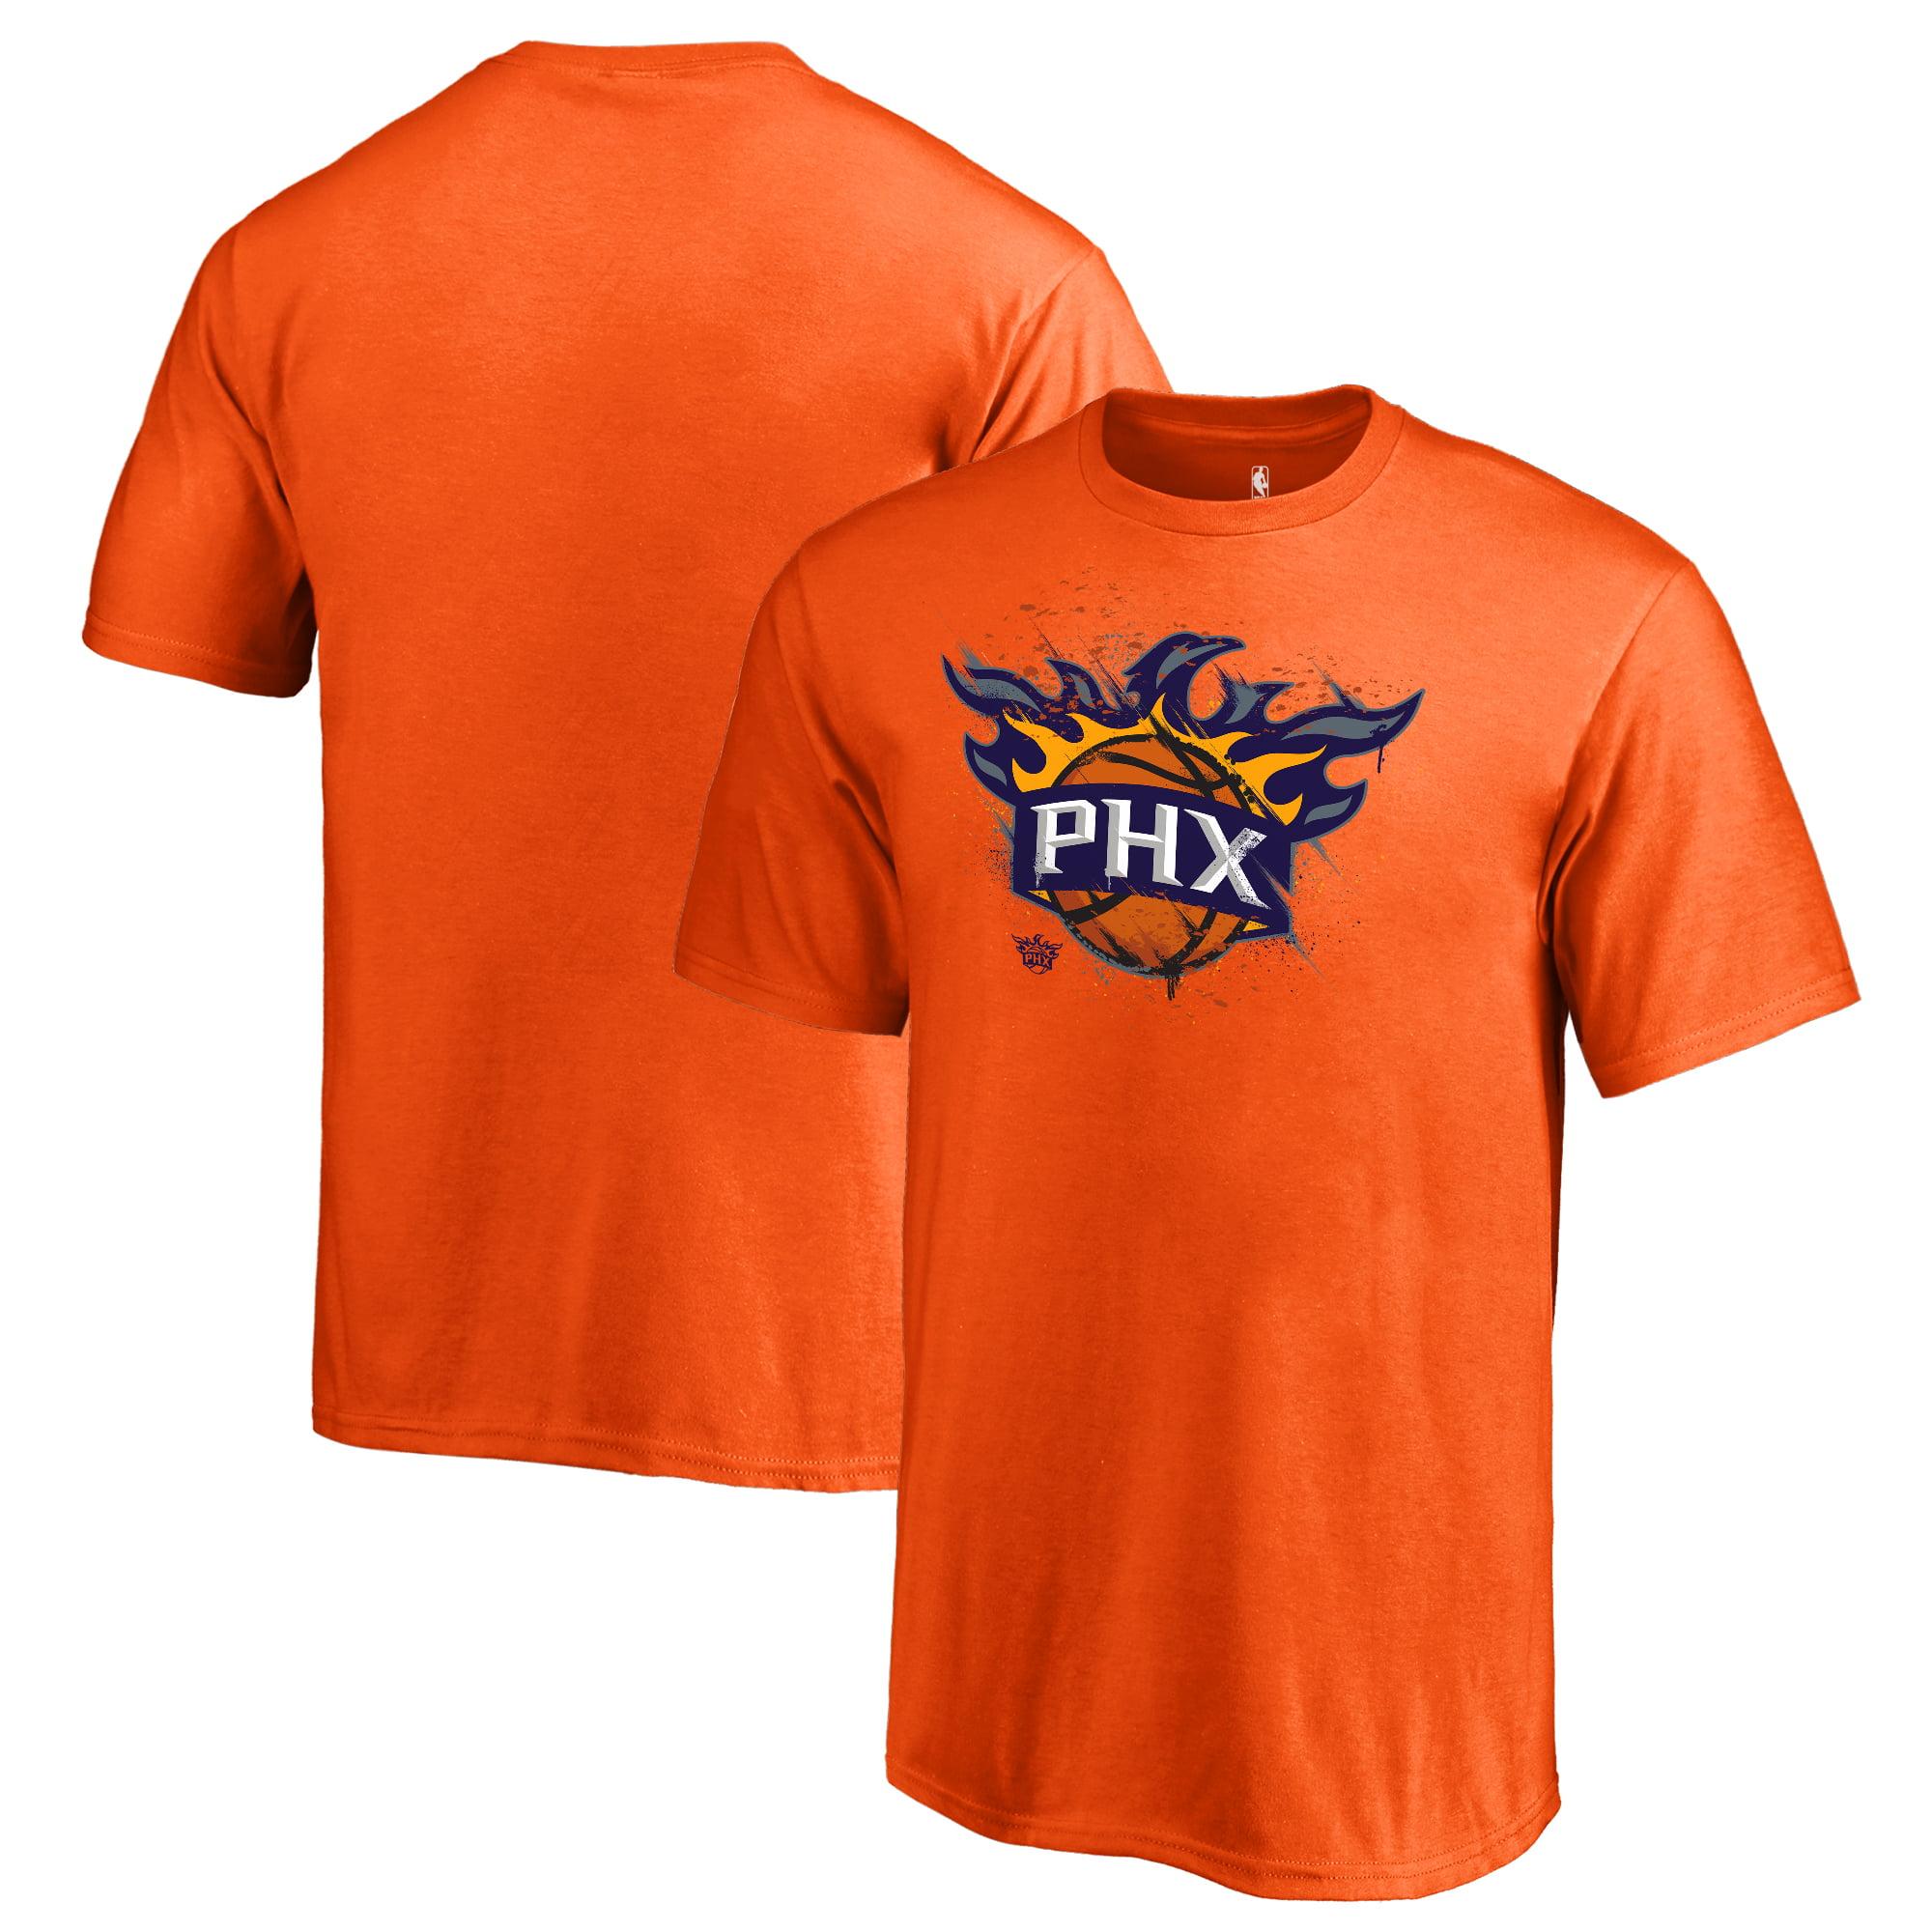 Phoenix Suns Fanatics Branded Youth Splatter Logo T-Shirt - Orange